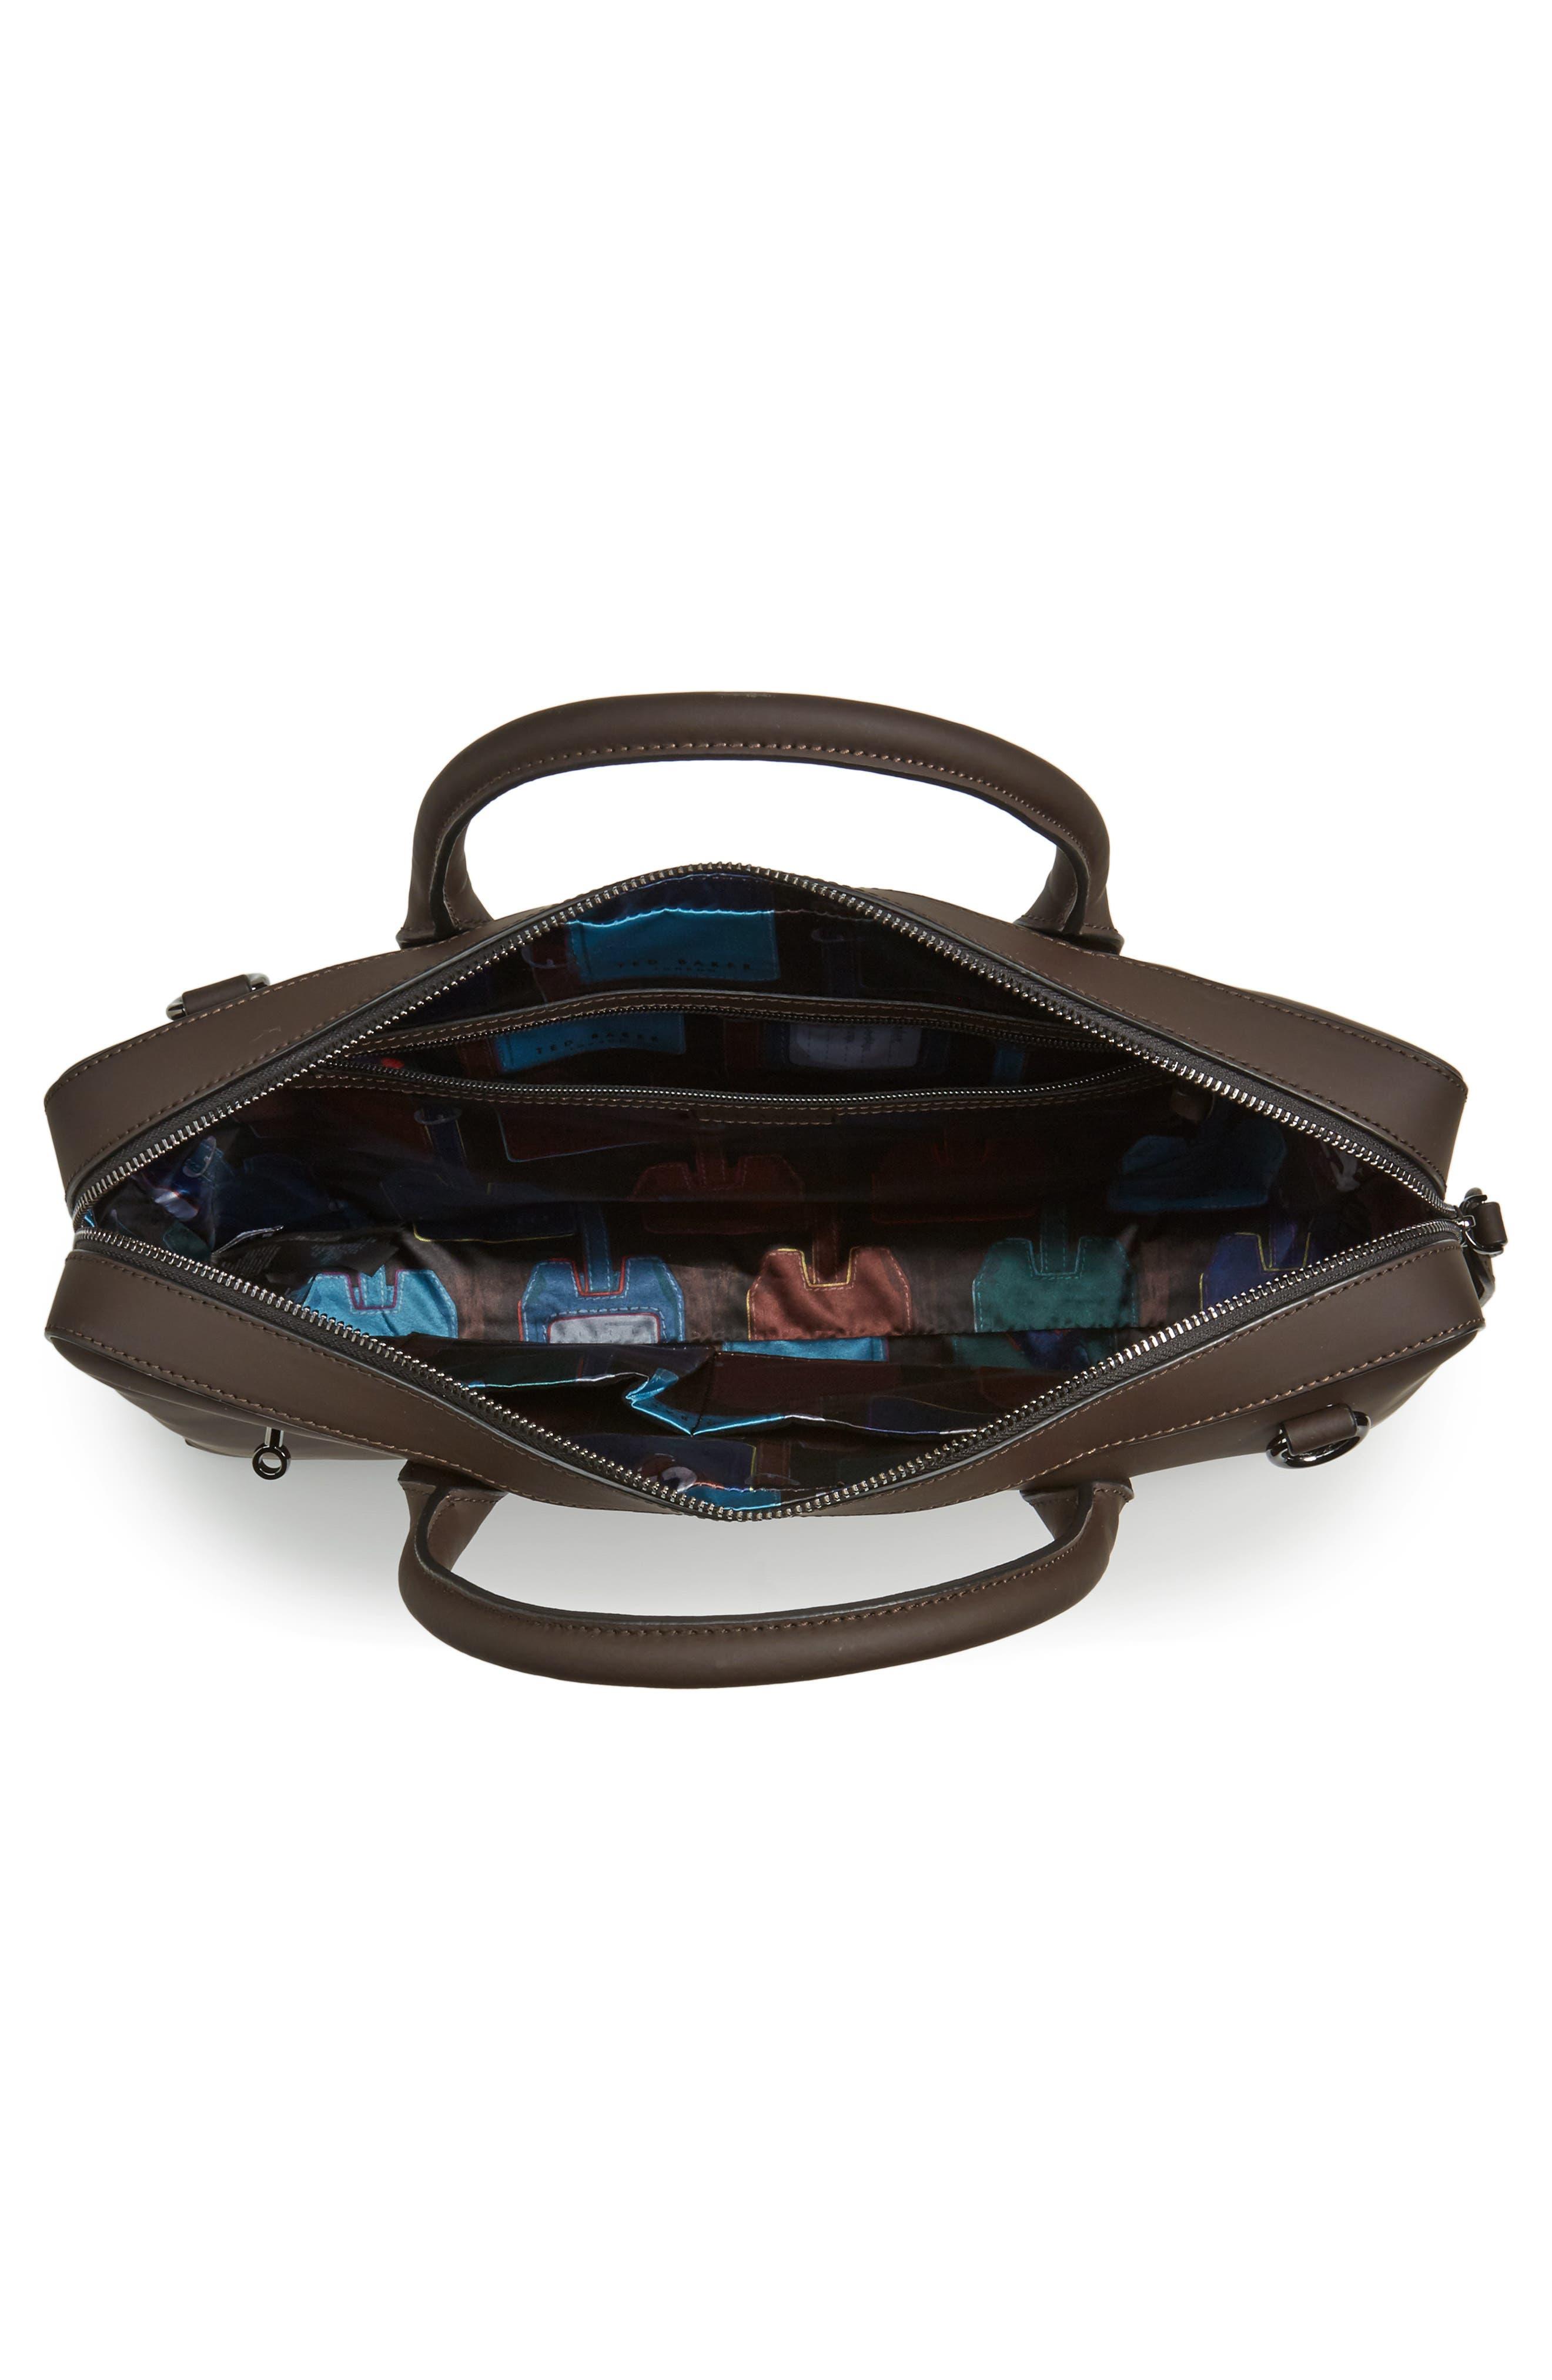 Ozboz Leather Briefcase,                             Alternate thumbnail 4, color,                             214